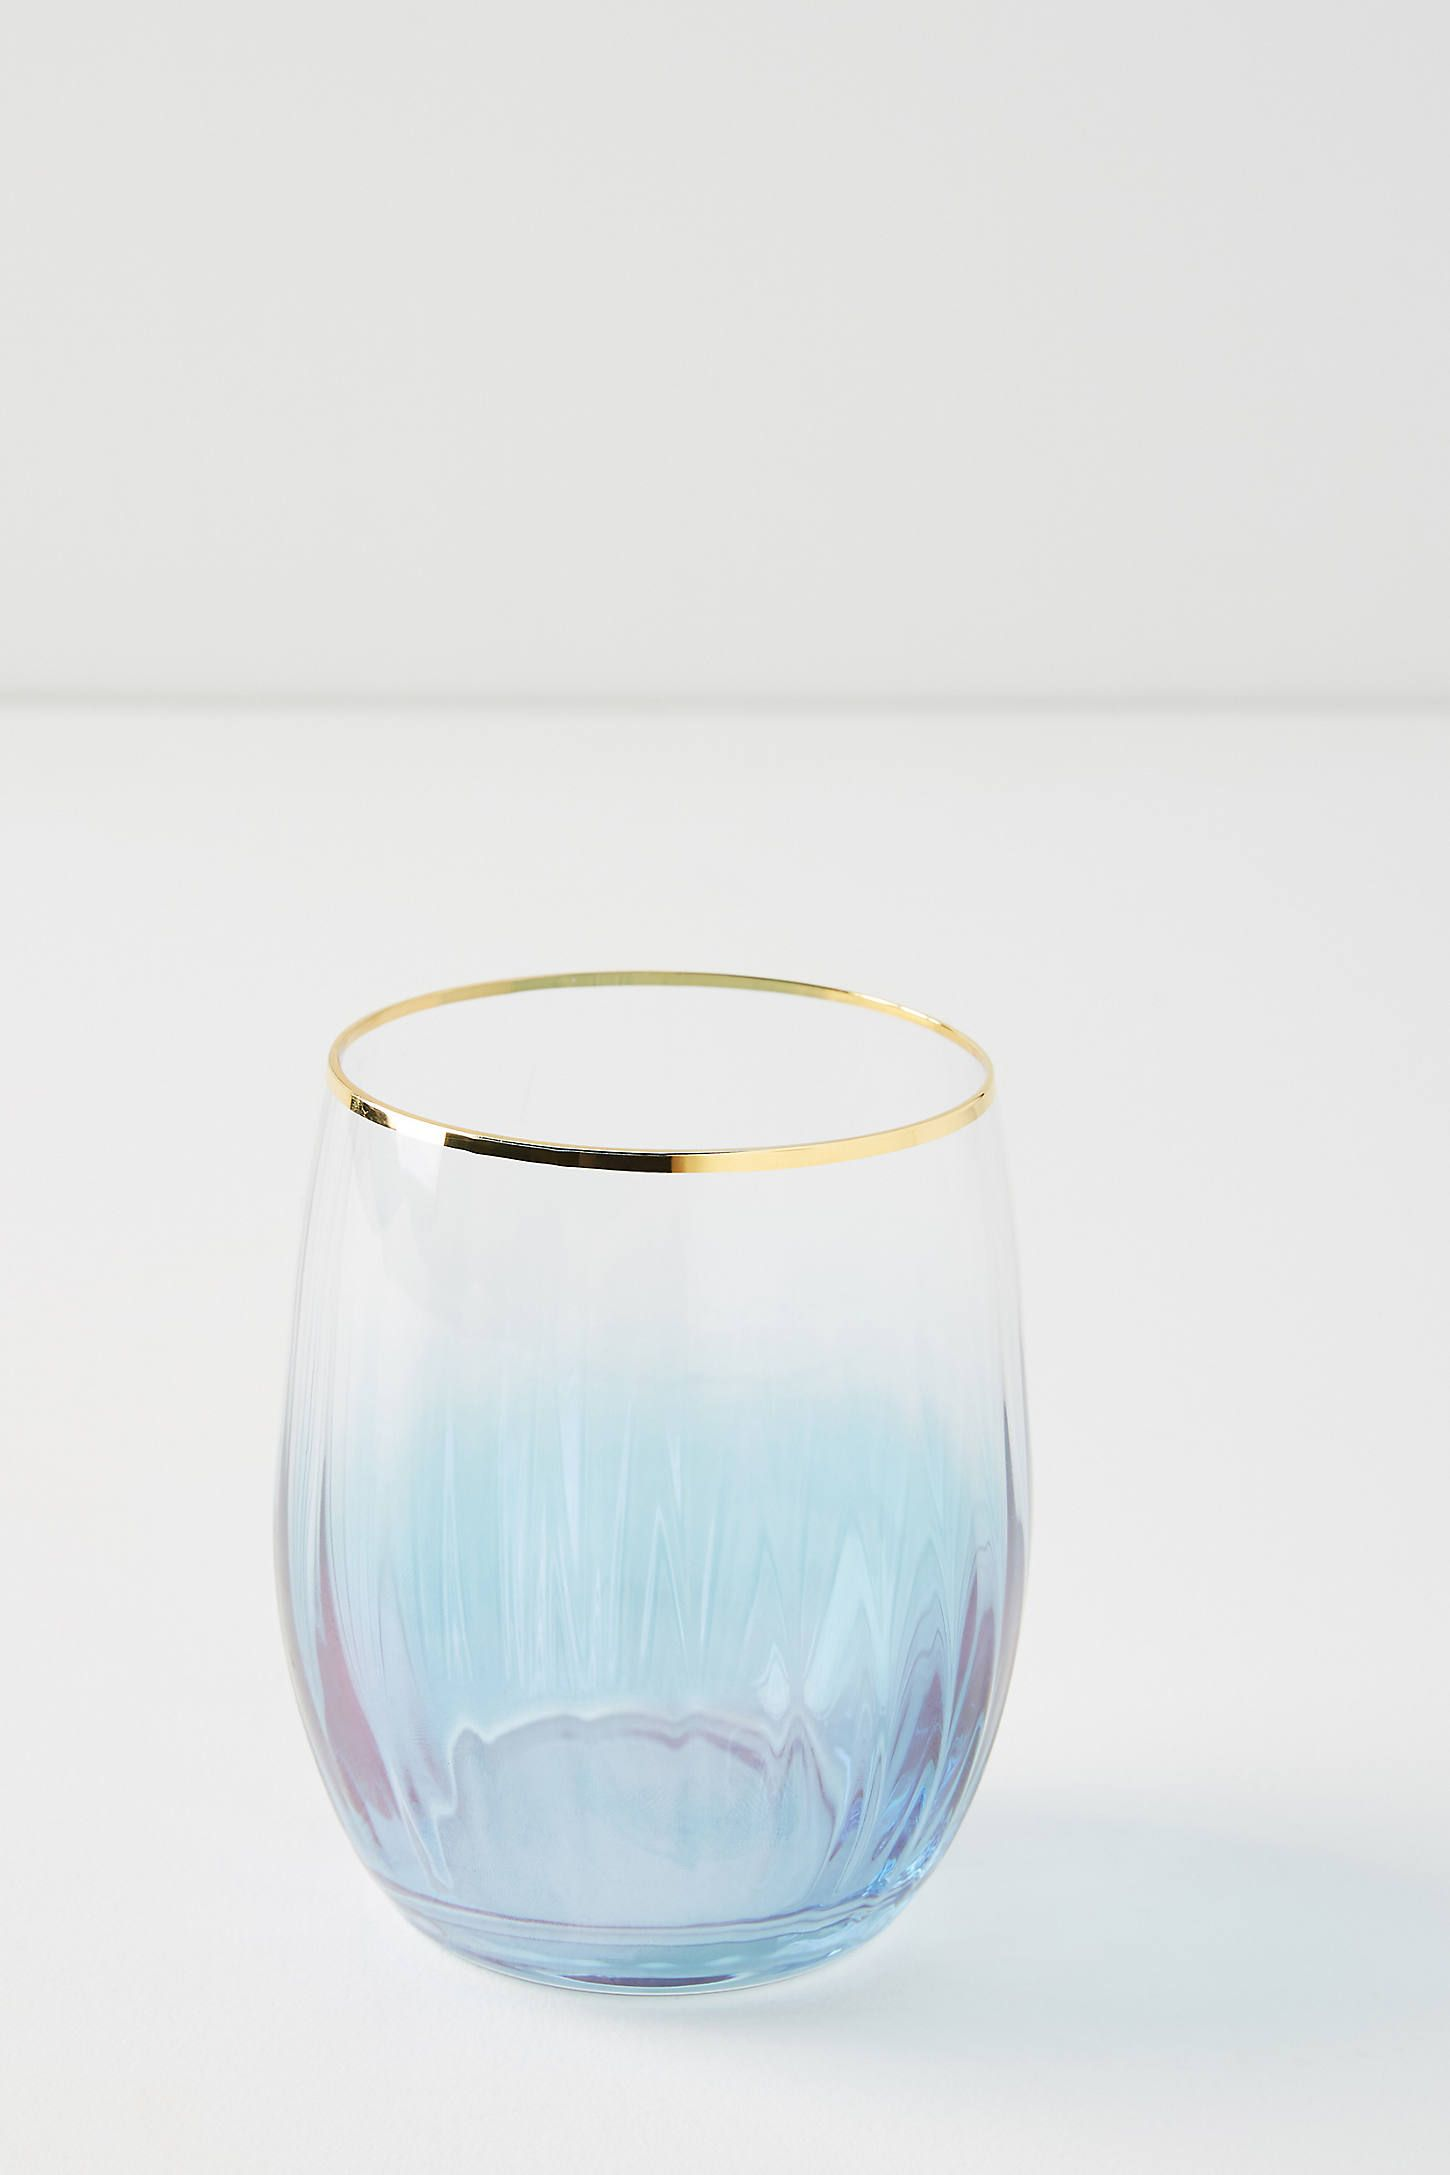 Stemless Wine GlassesWine Tumblers